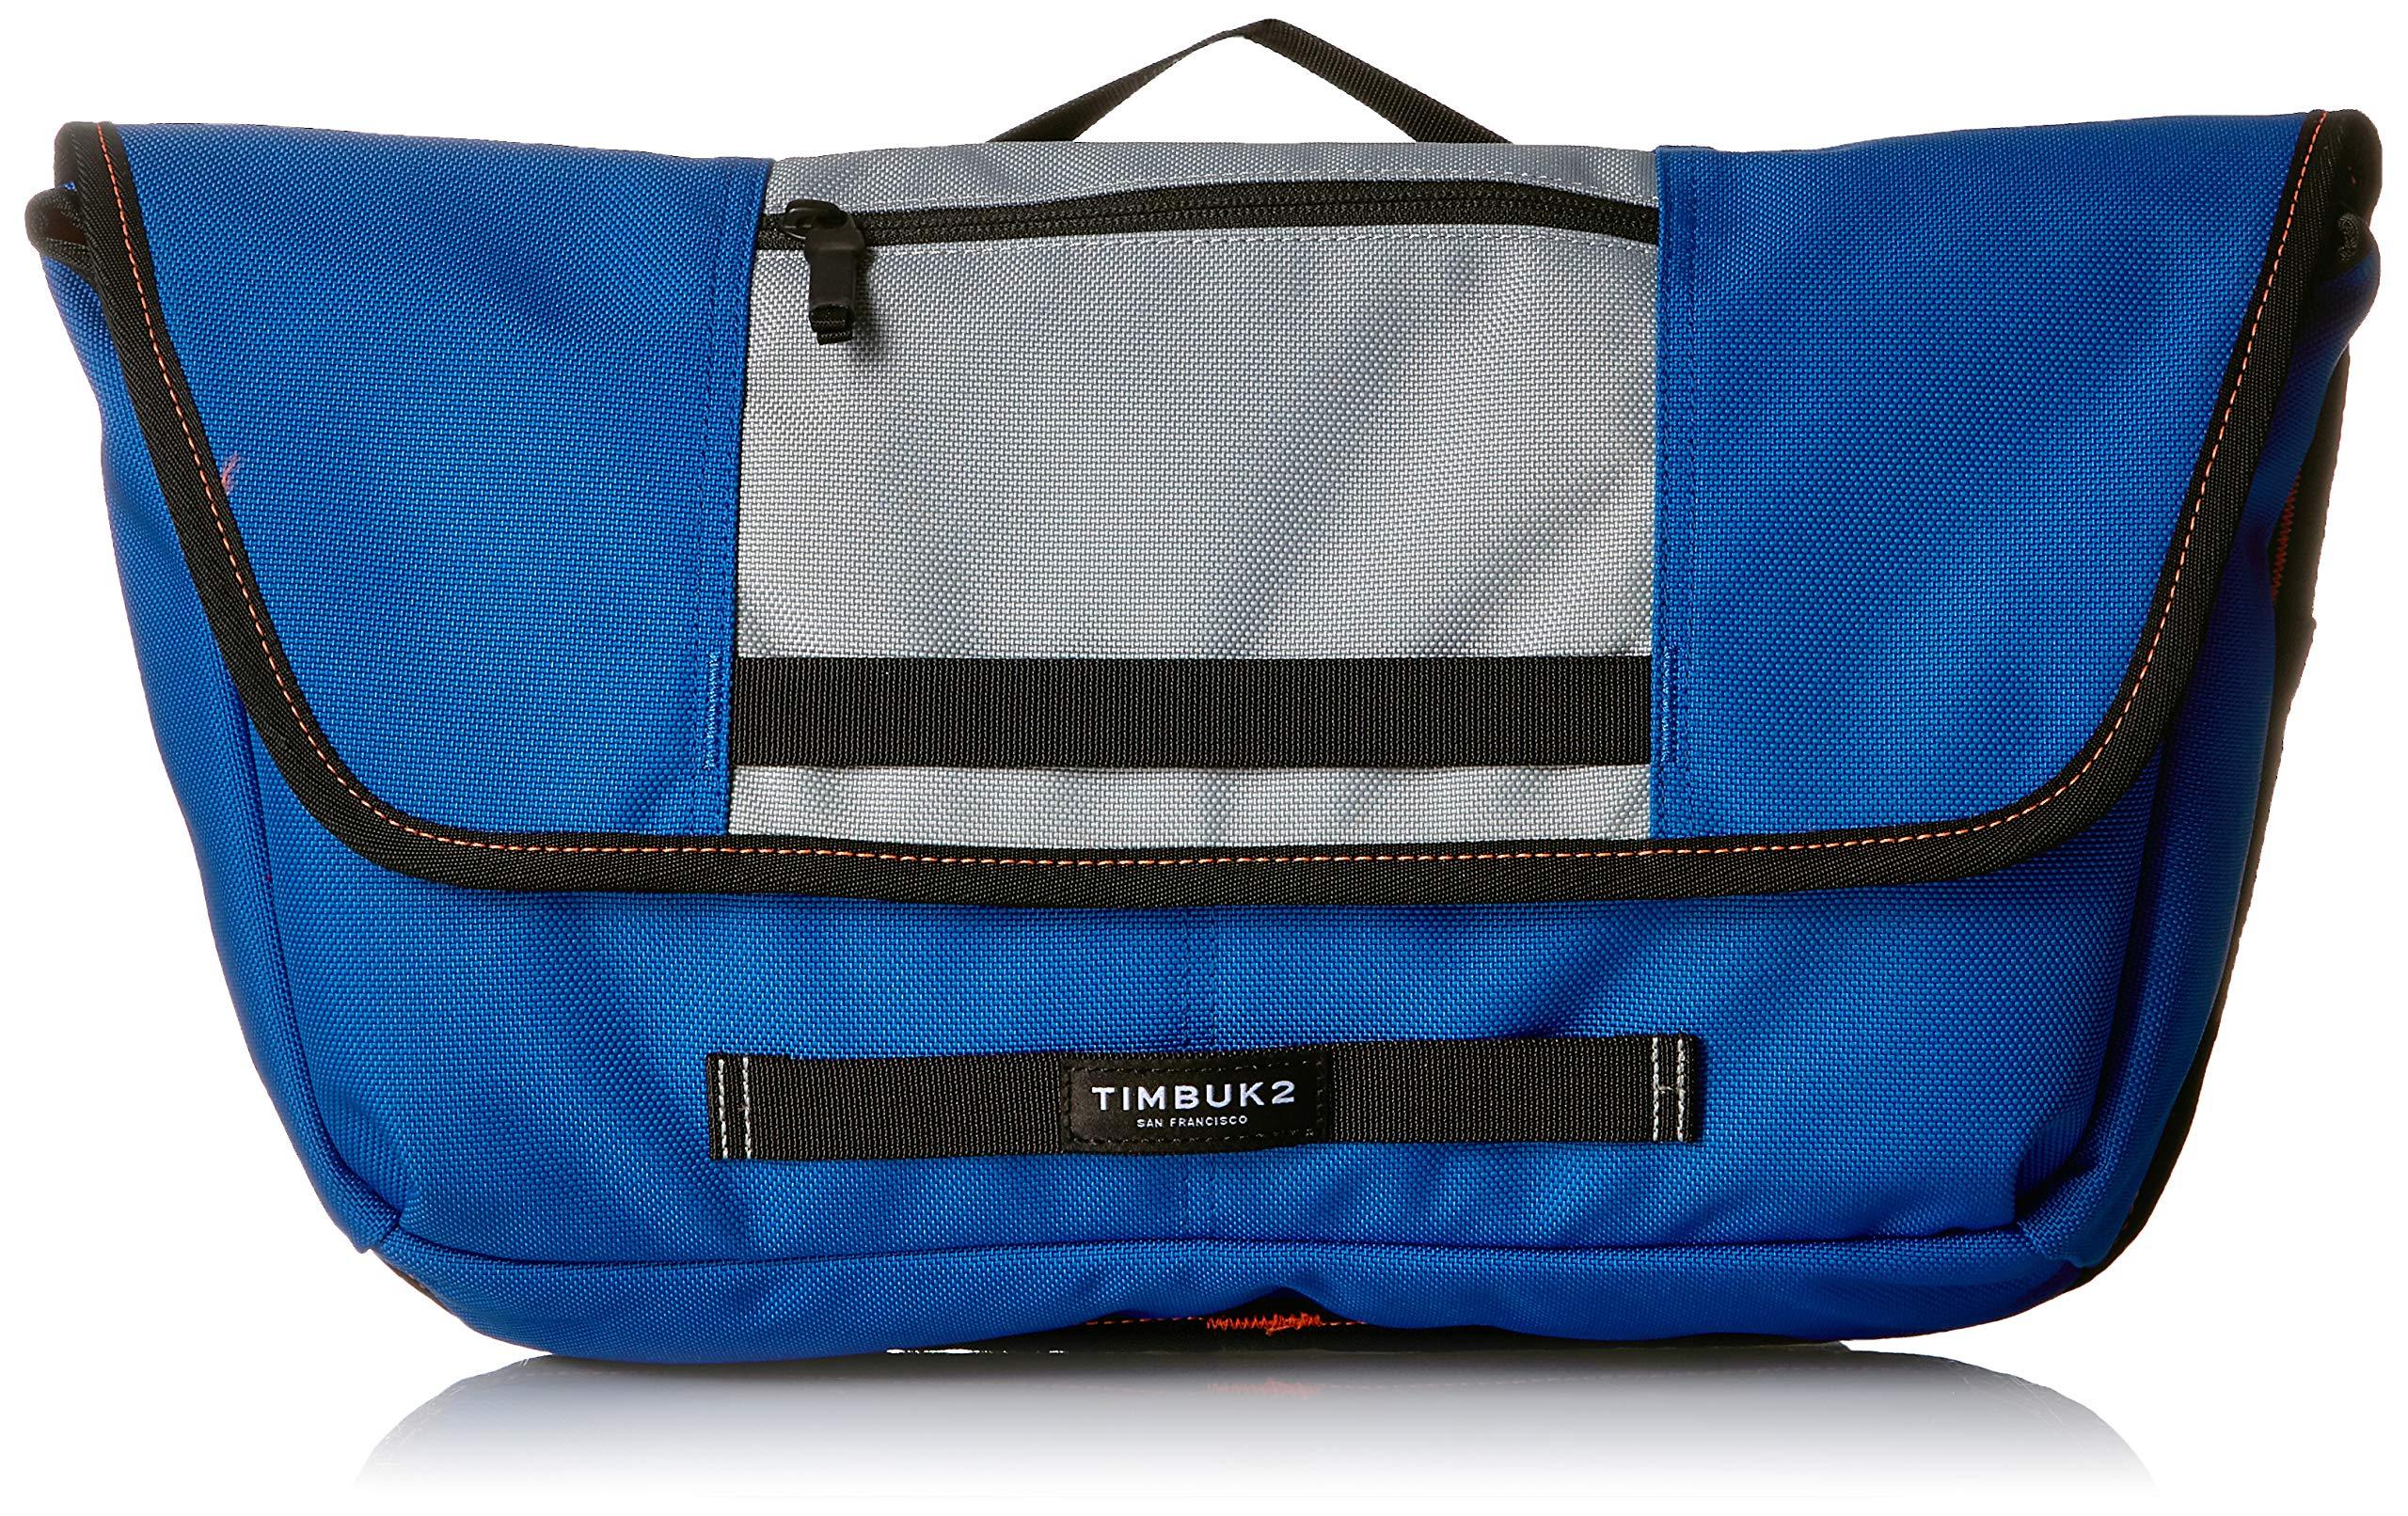 Timbuk2 Catapult Sling Bag, Track, One Size by Timbuk2